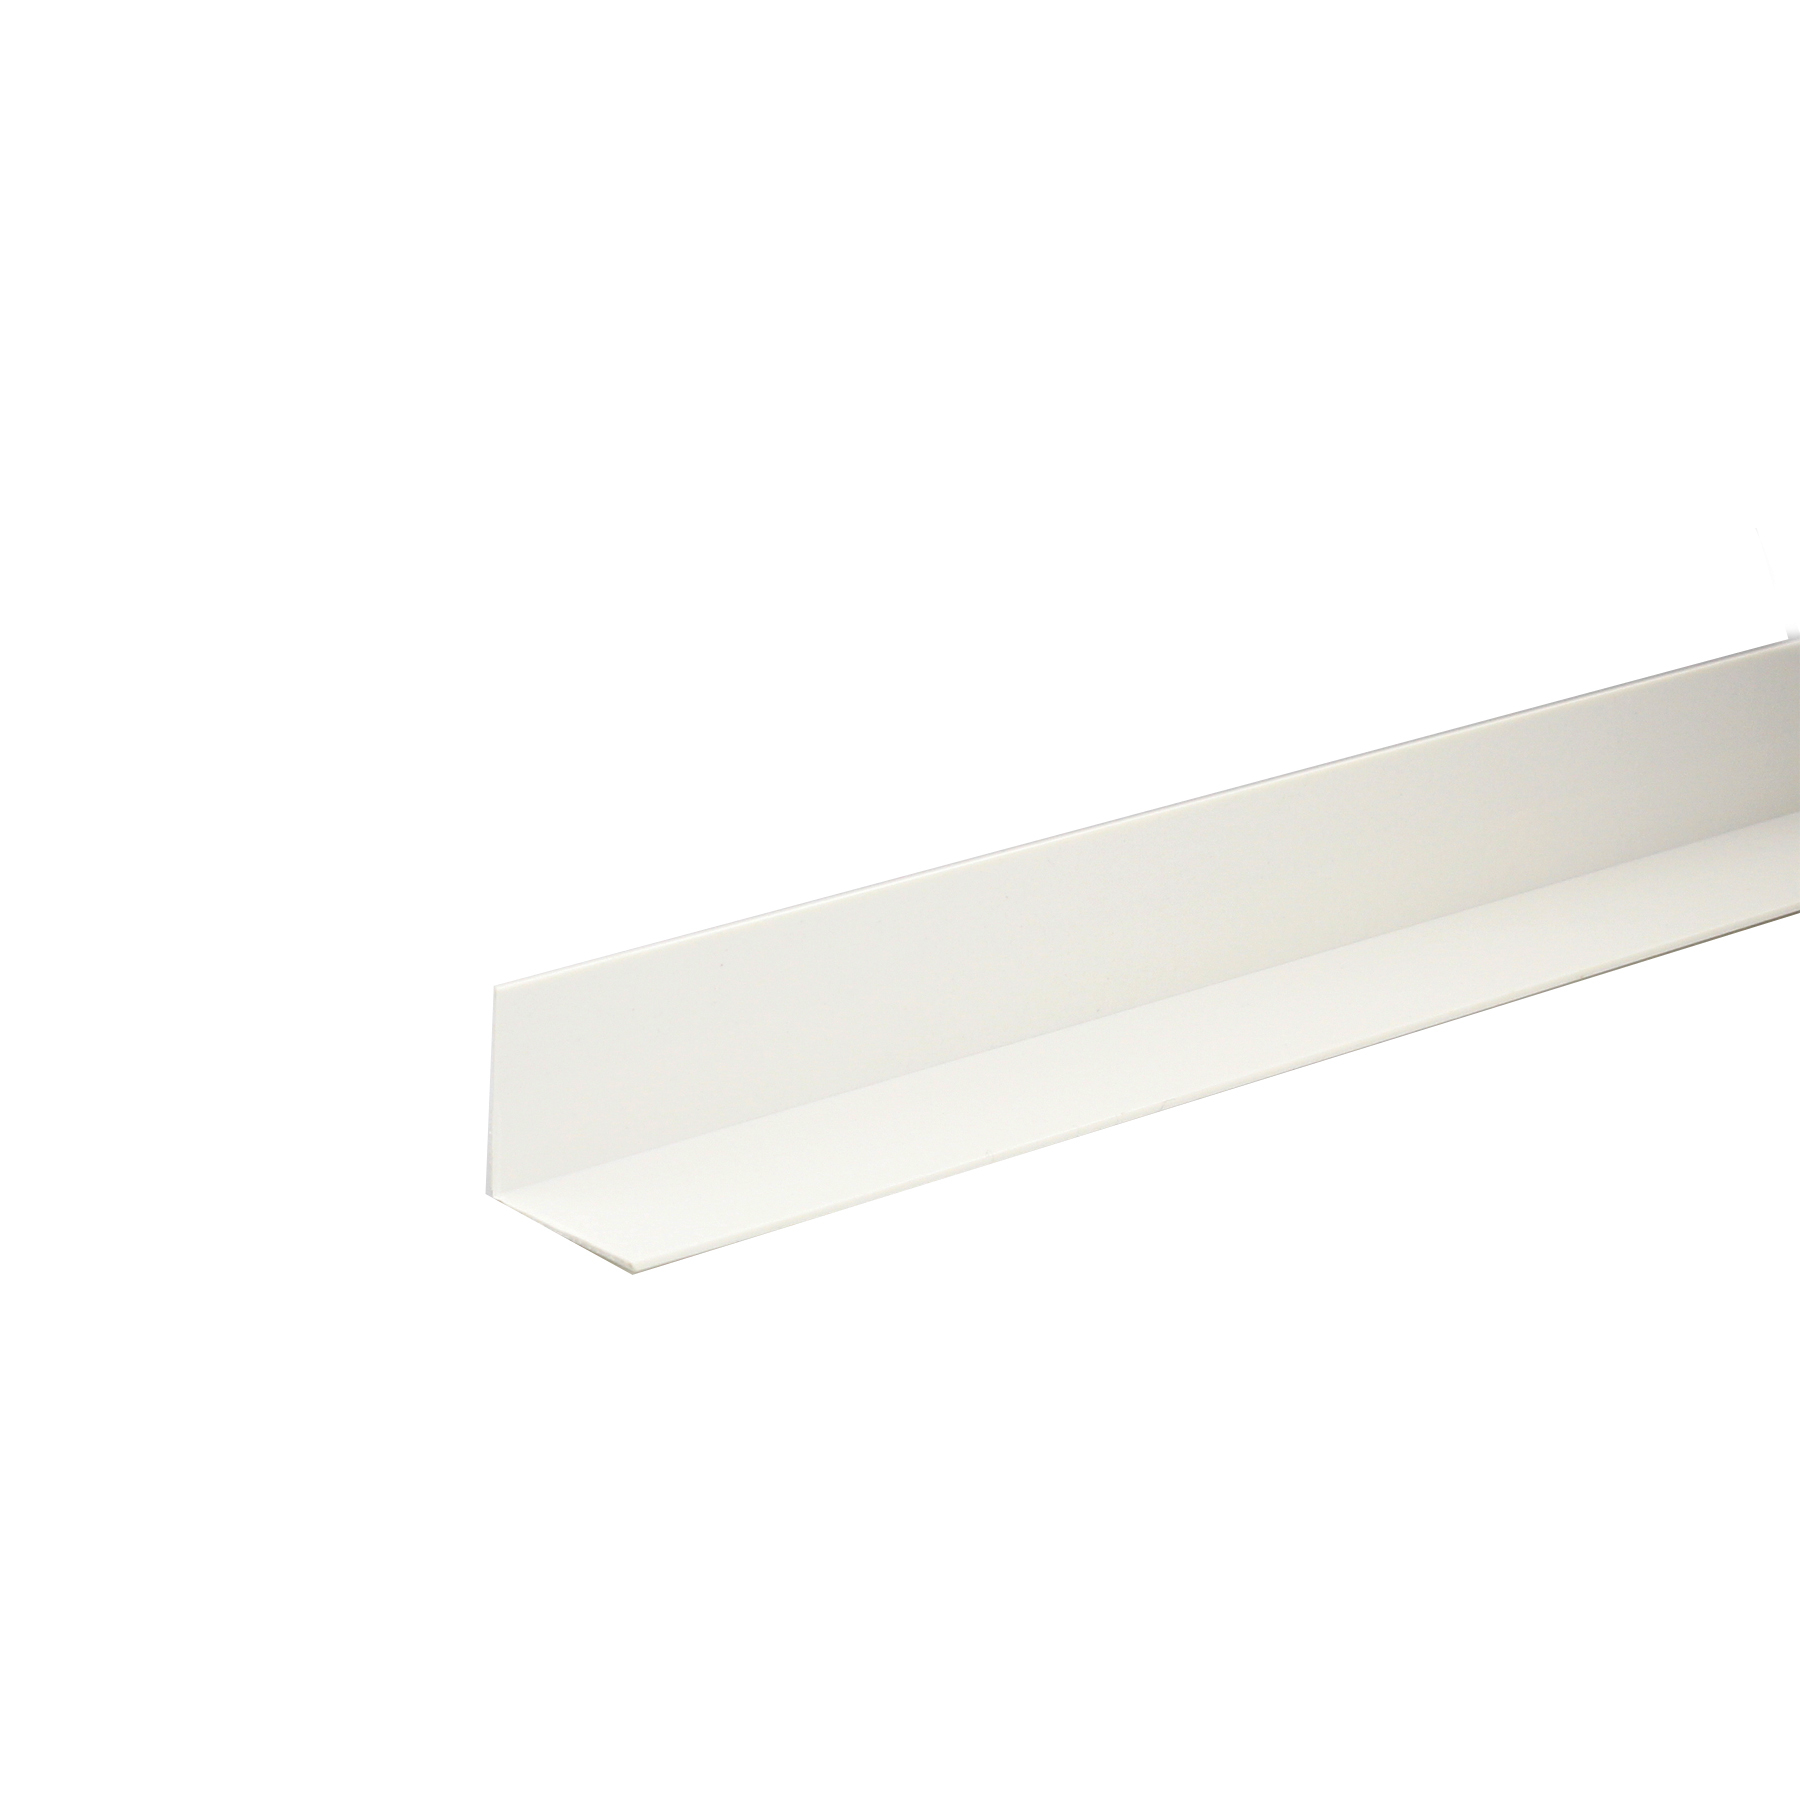 Perfil Angular Diferente PVC Porcelana 1mx2,5cm